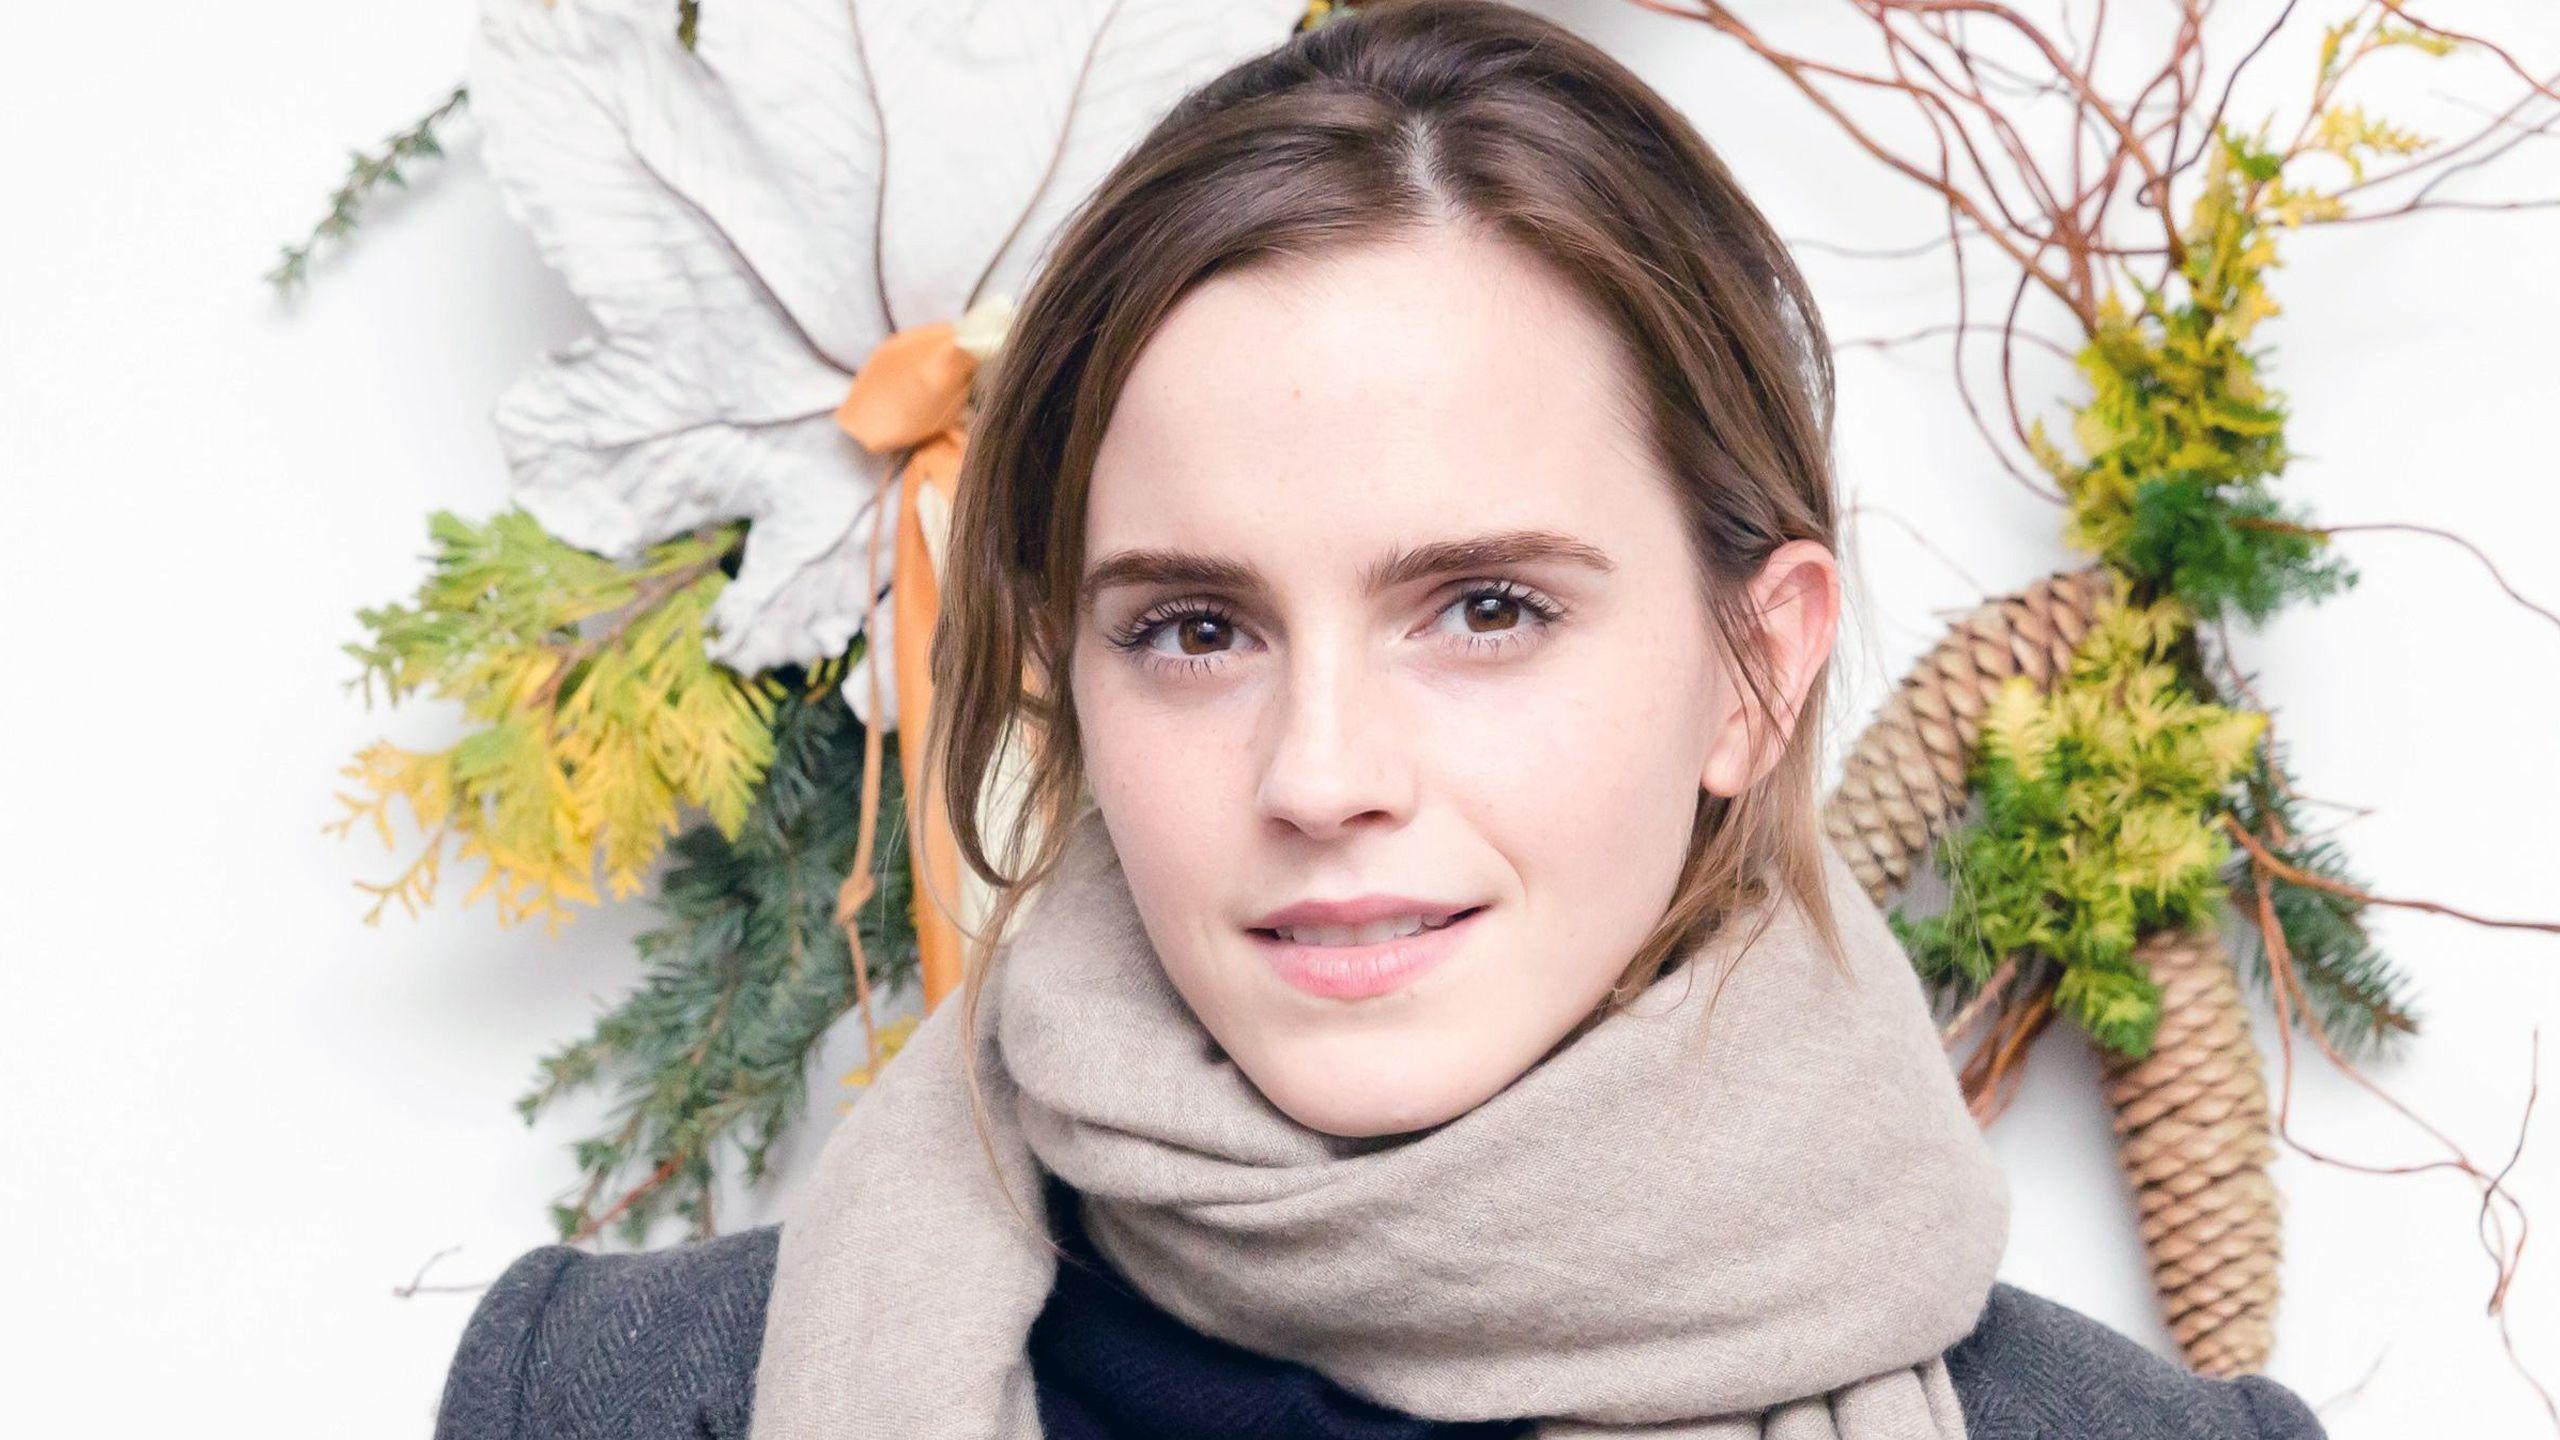 Emma Watson Wallpapers 2560×1440 Emma Watson Pics Wallpapers (58 Wallpapers) | Adorable Wallpapers